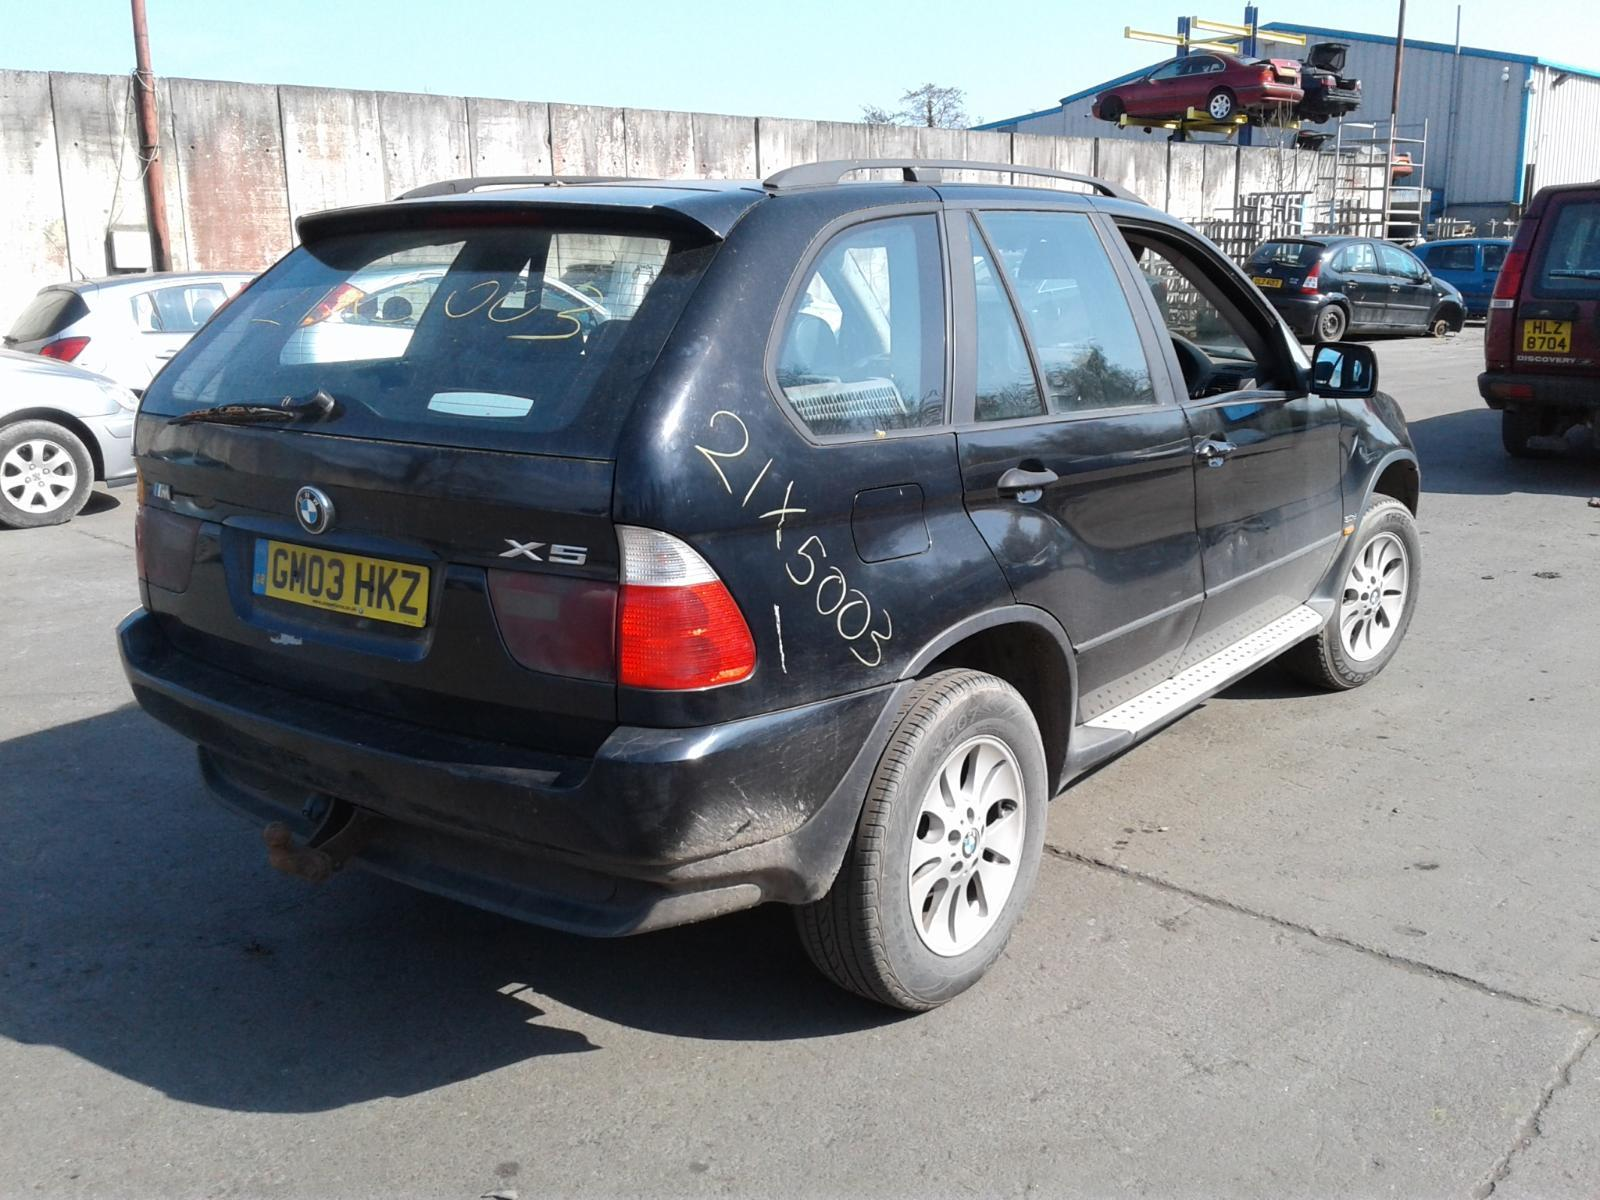 2005 BMW X5 Image